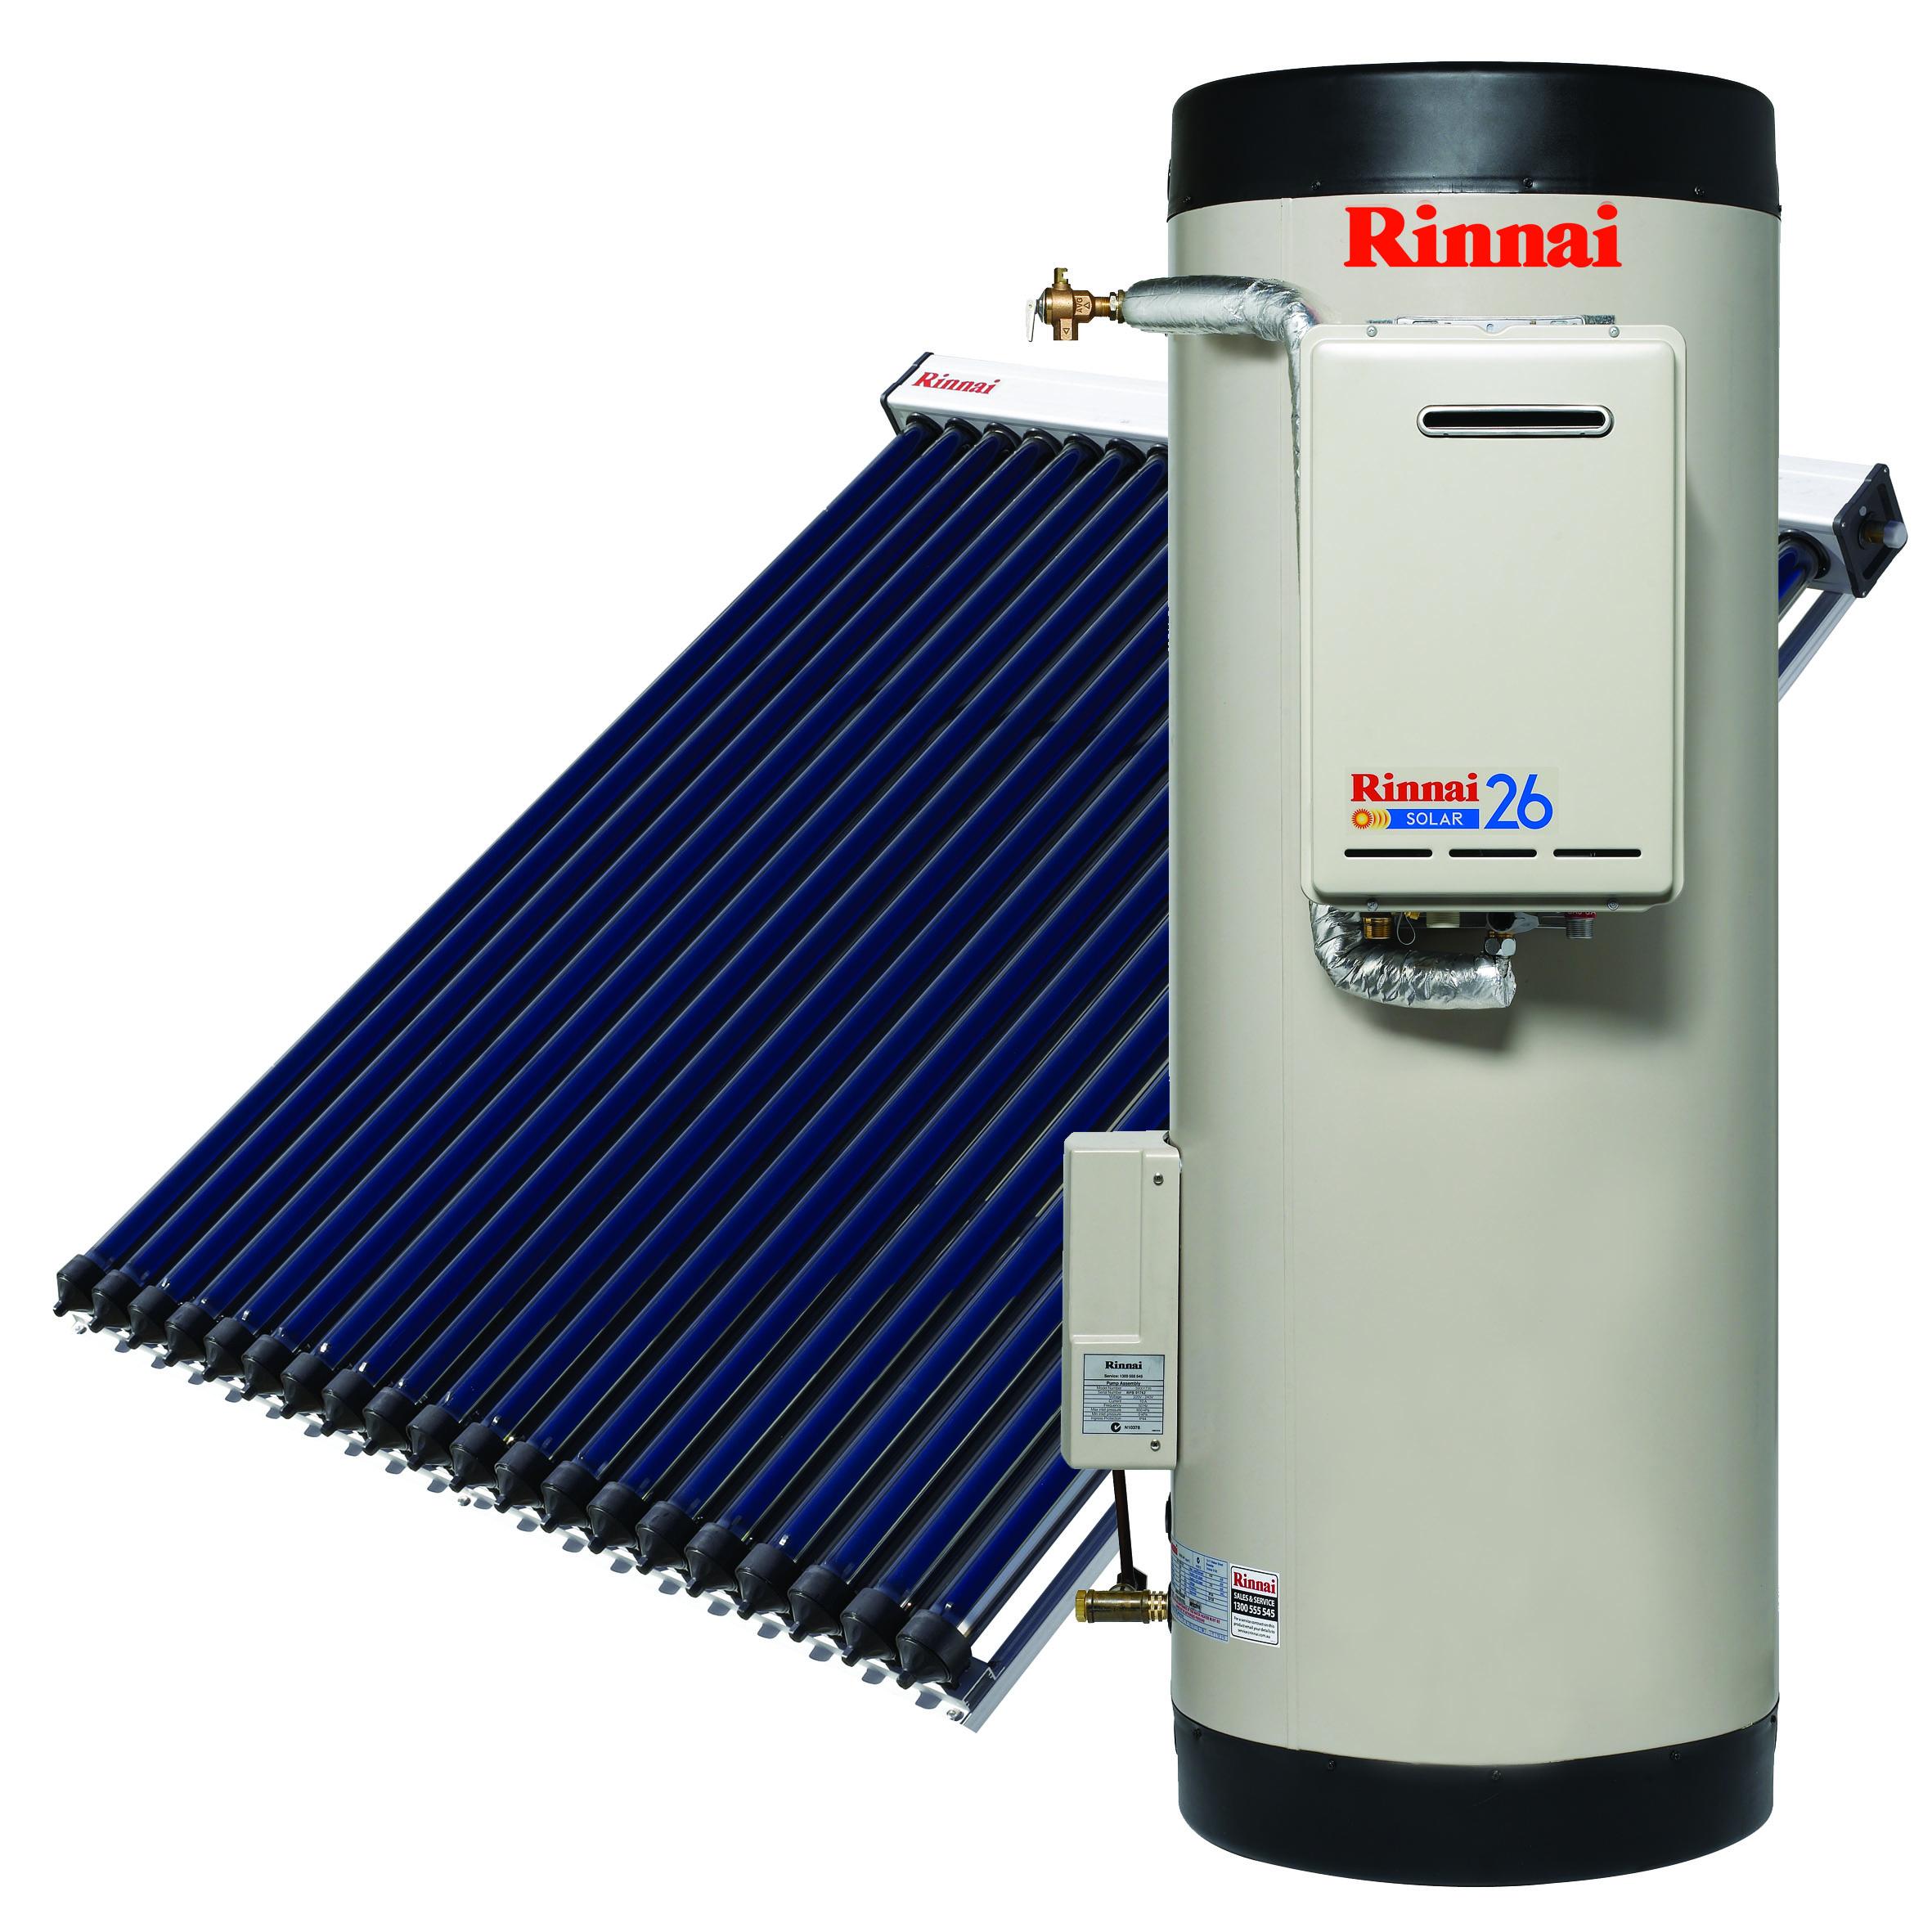 11c60ea1 4525 47fc b7ab 601995e0f53c - Solar Hot Water System